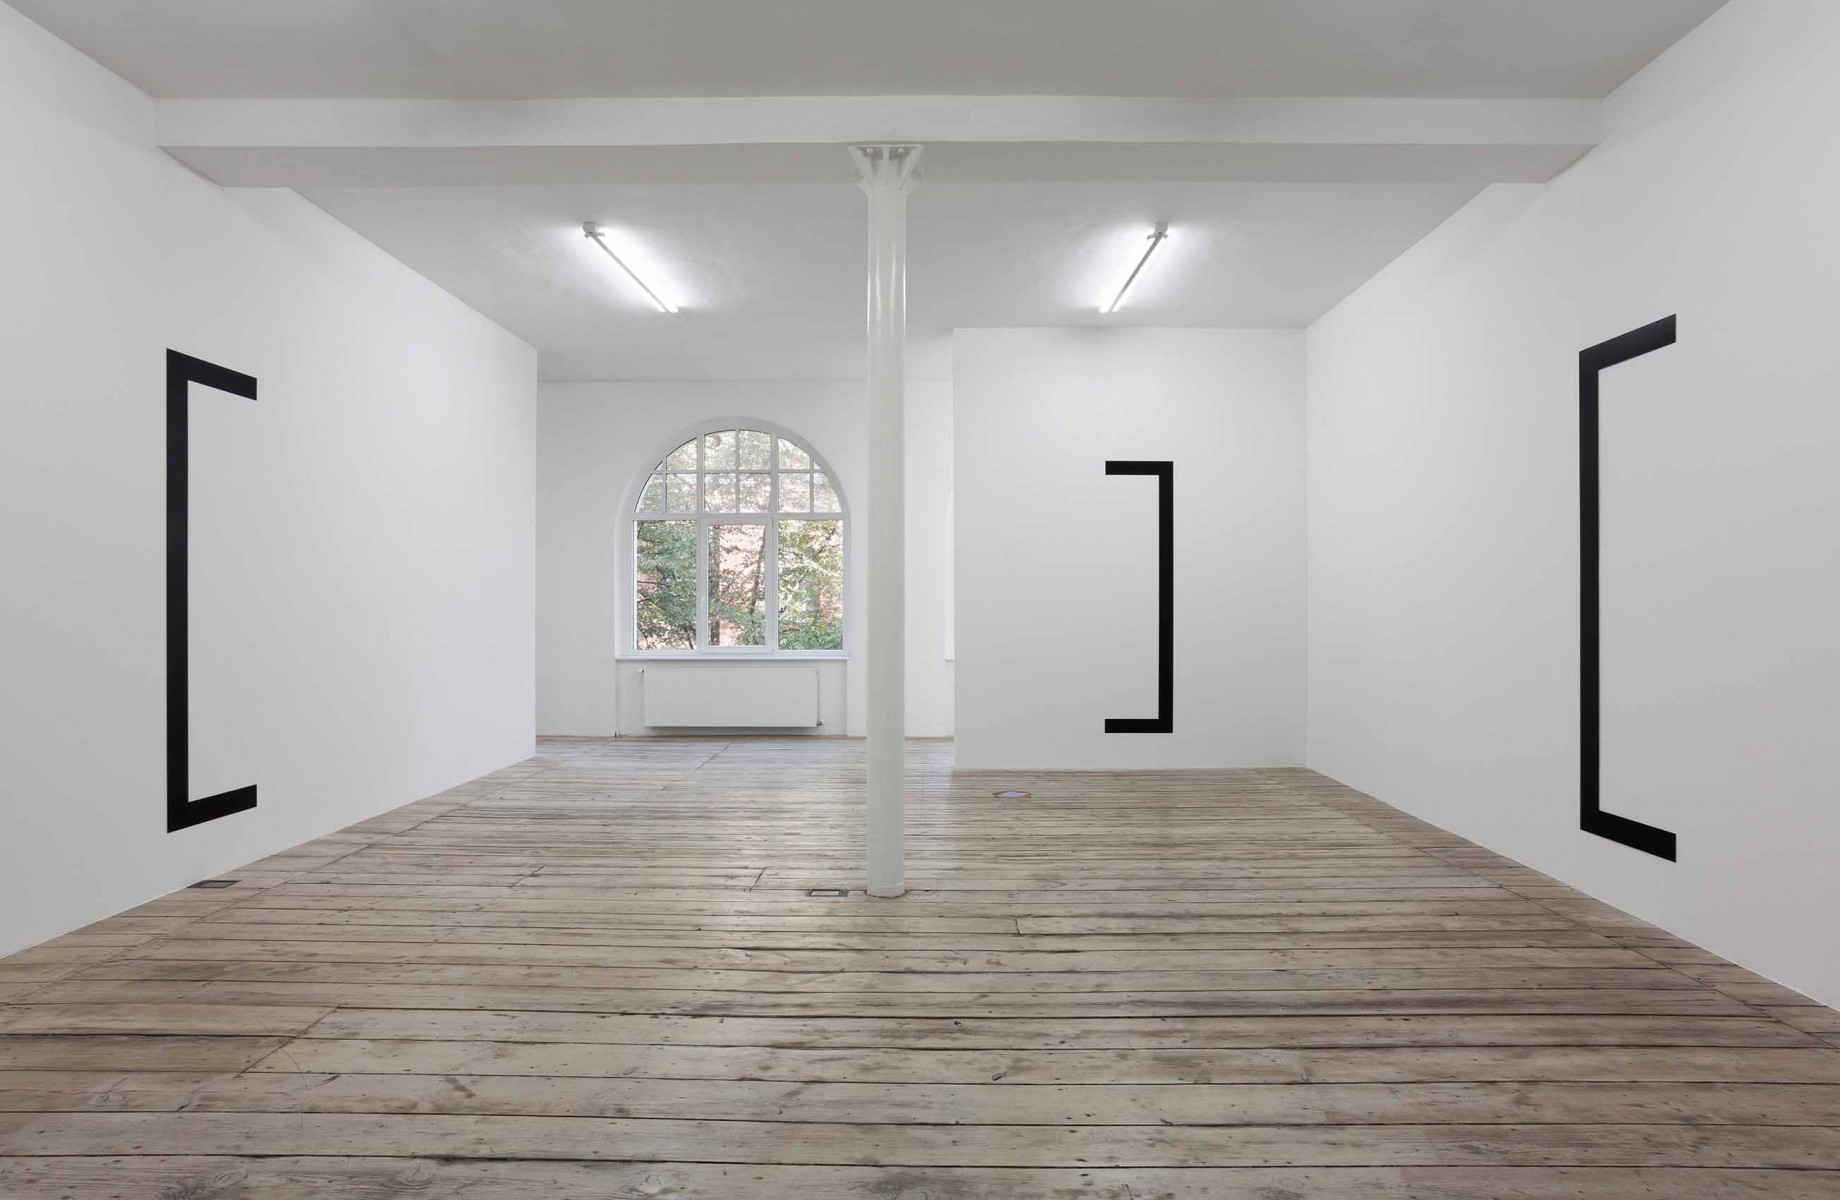 Hinrich Weidemann Untitled 2012